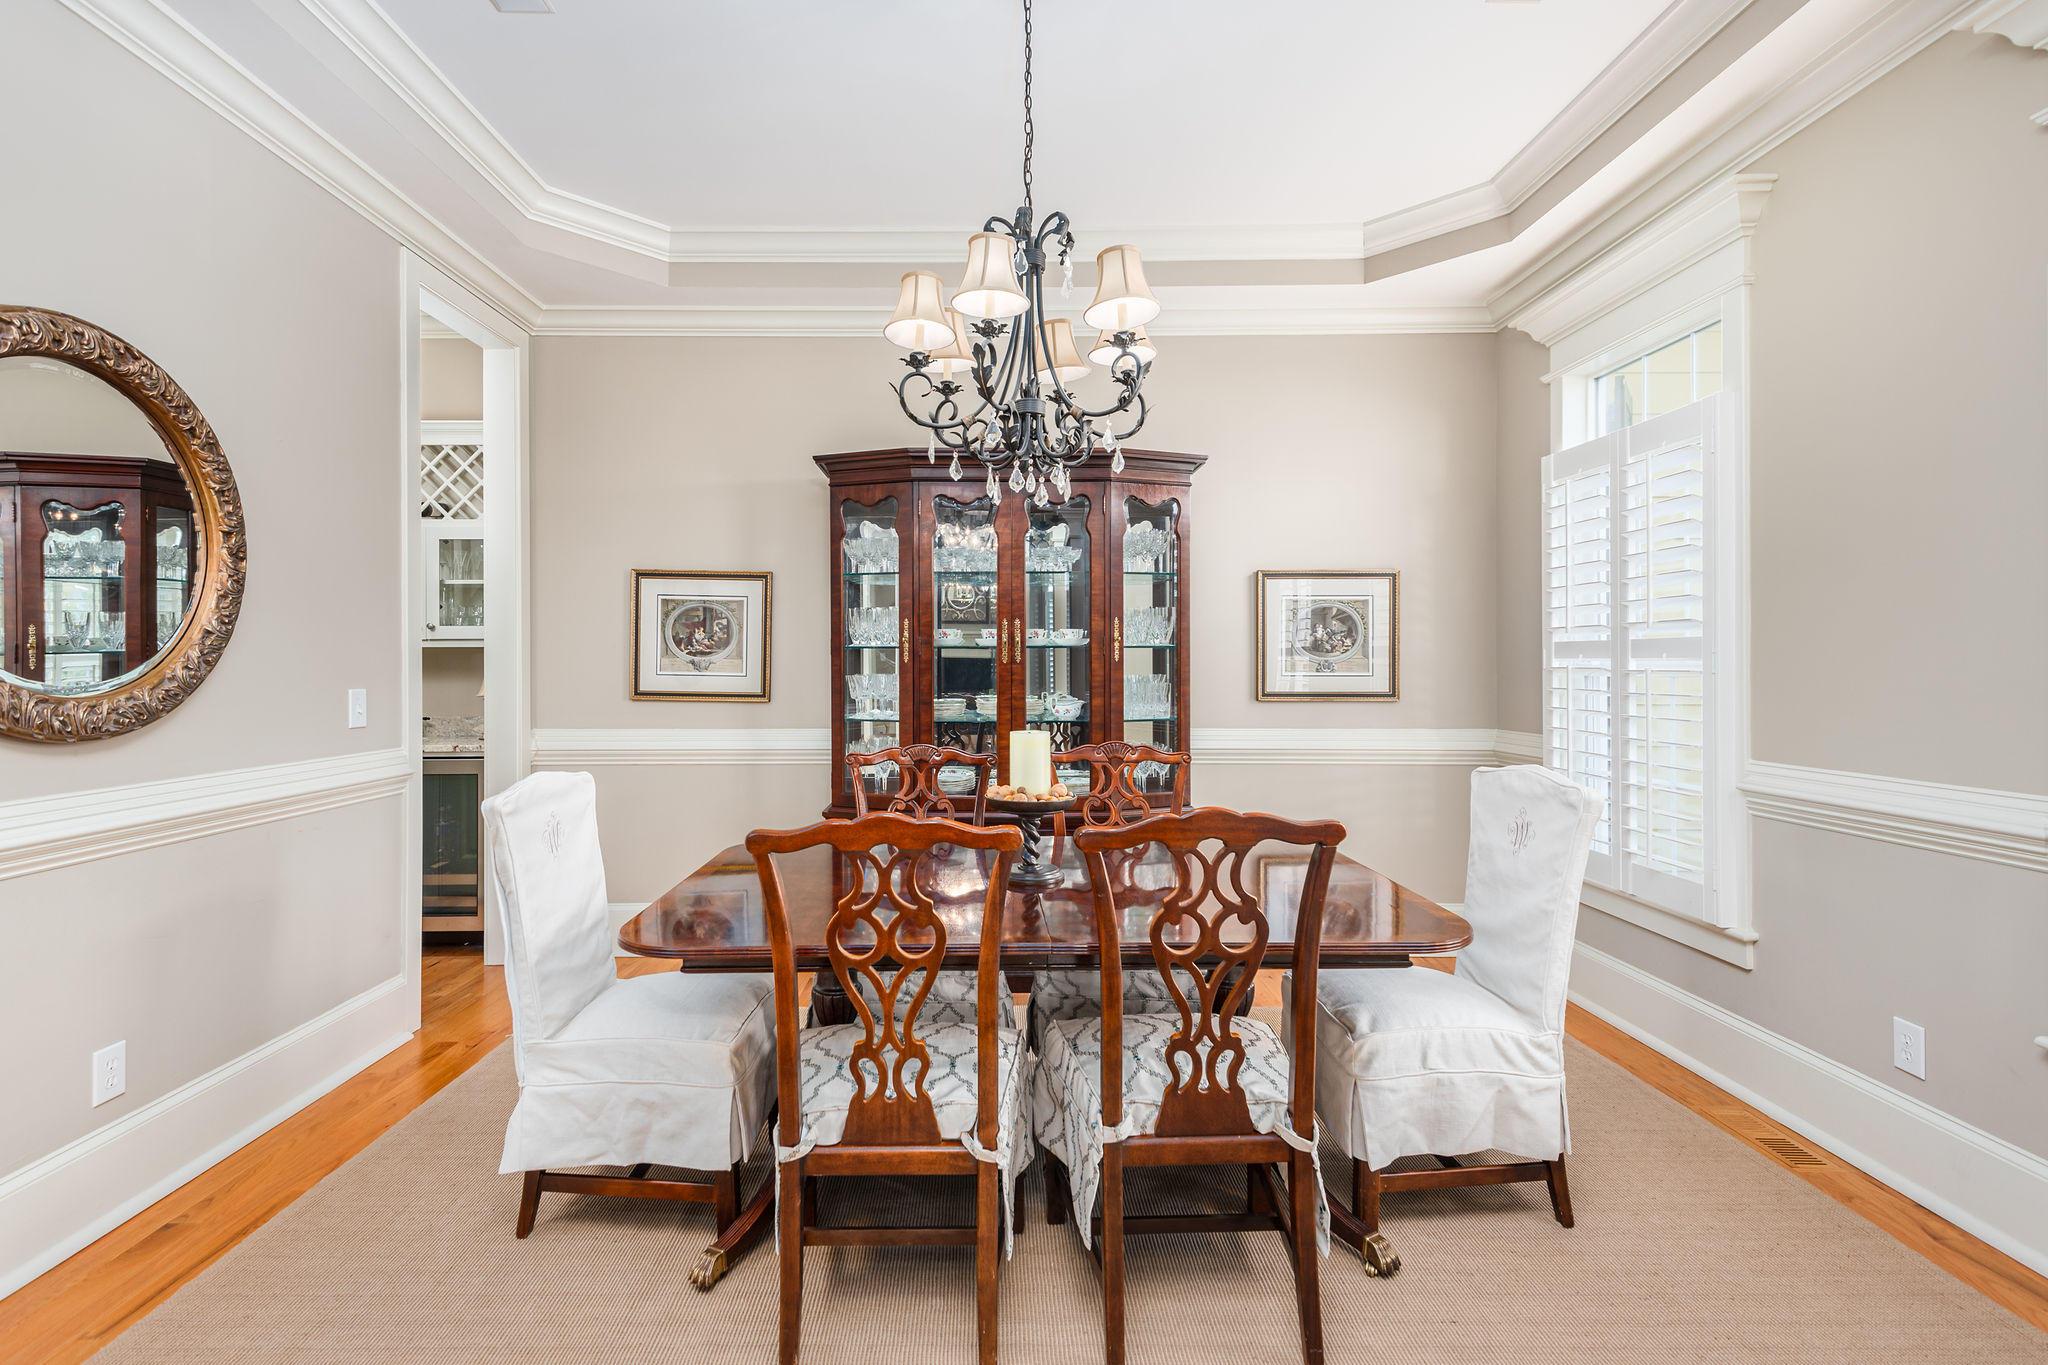 Dunes West Homes For Sale - 1305 King Bird, Mount Pleasant, SC - 44